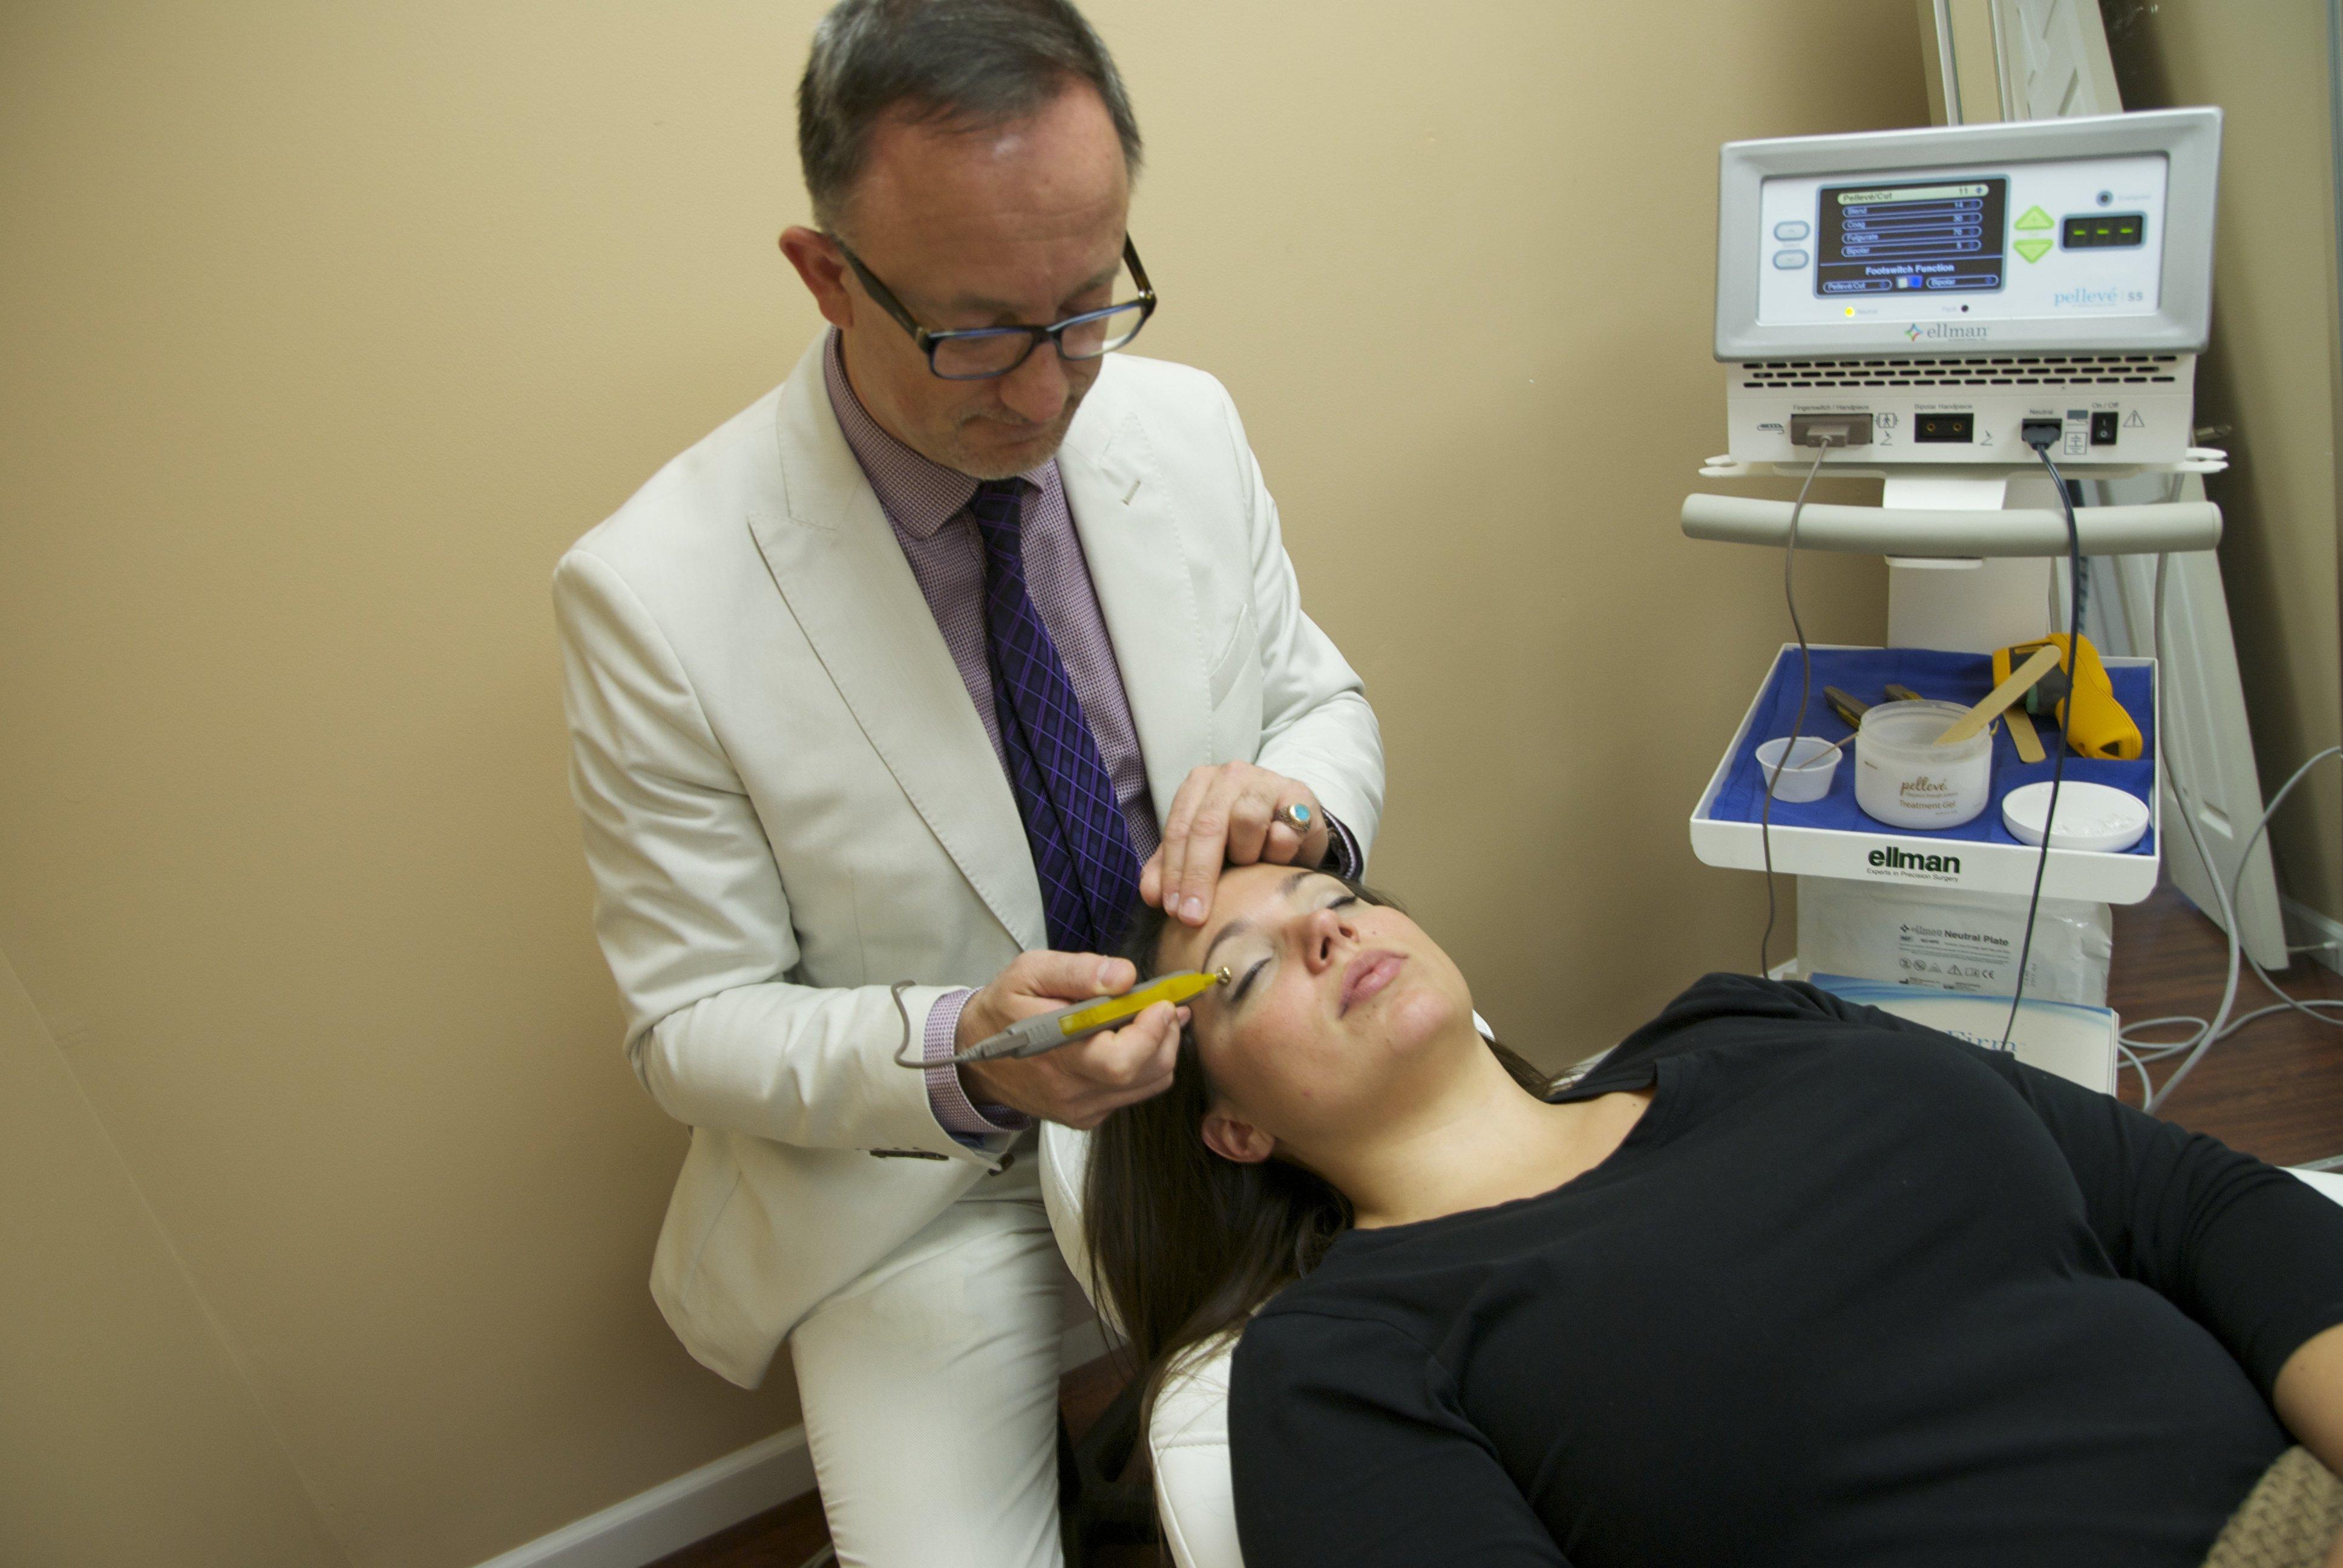 Pellevè Anti-Aging treatment